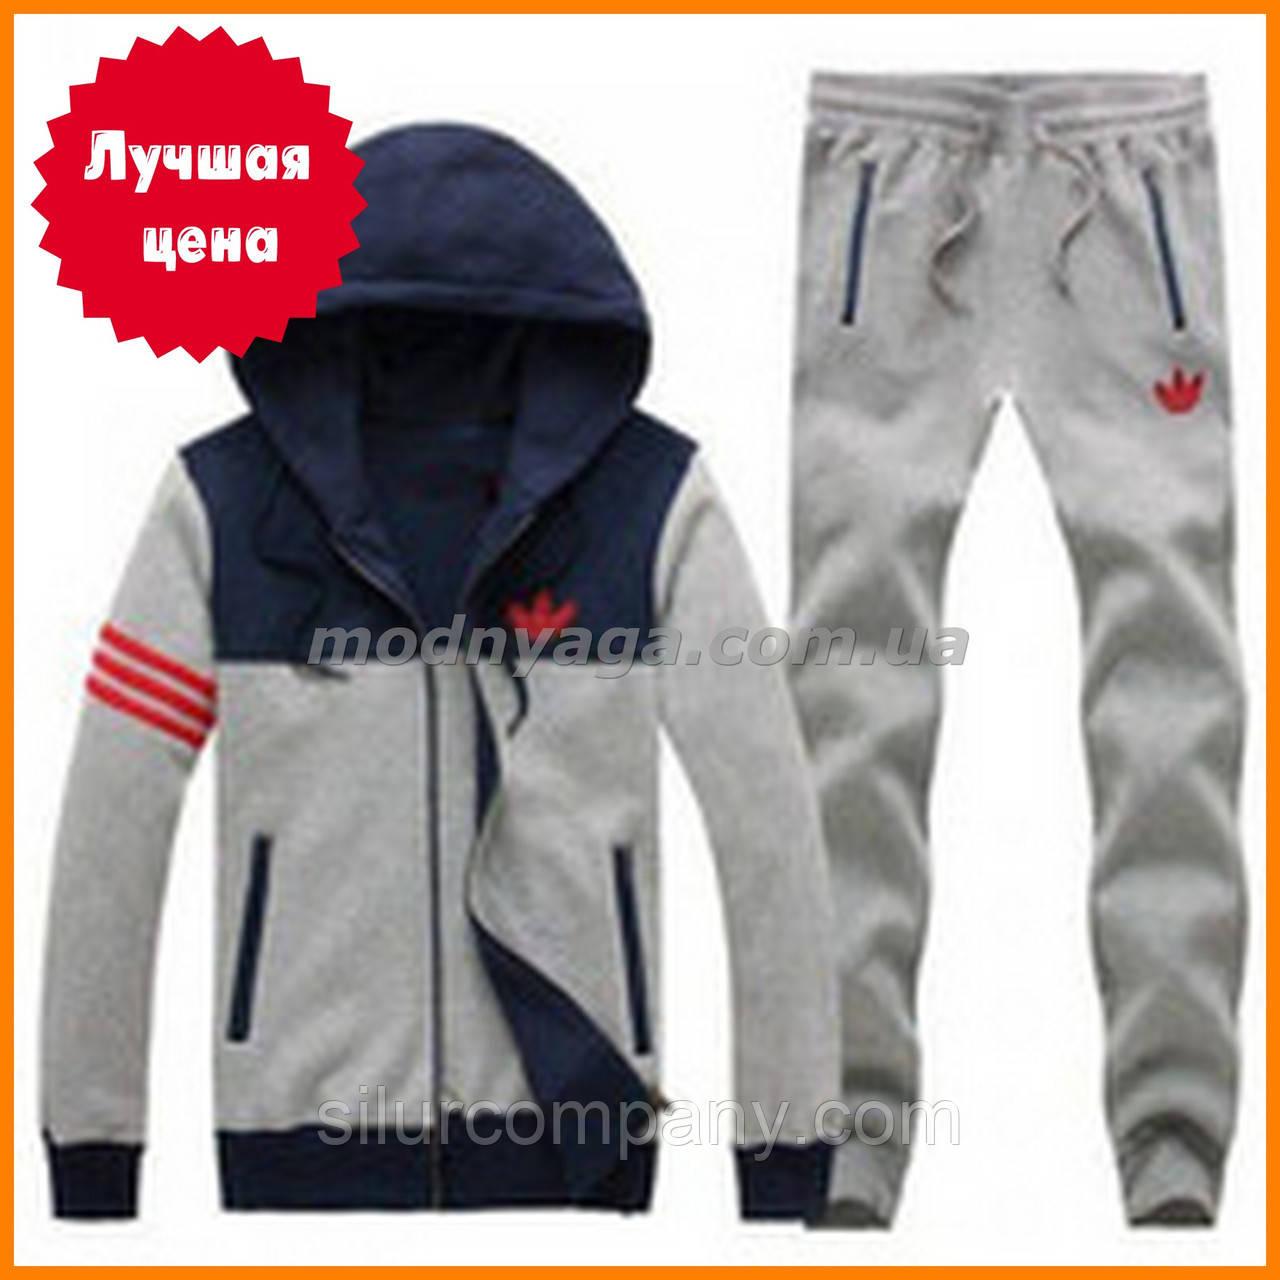 8c6c11f4a3fe86 Дитячий спортивний костюм для хлопчика | Адидас - Интернет магазин